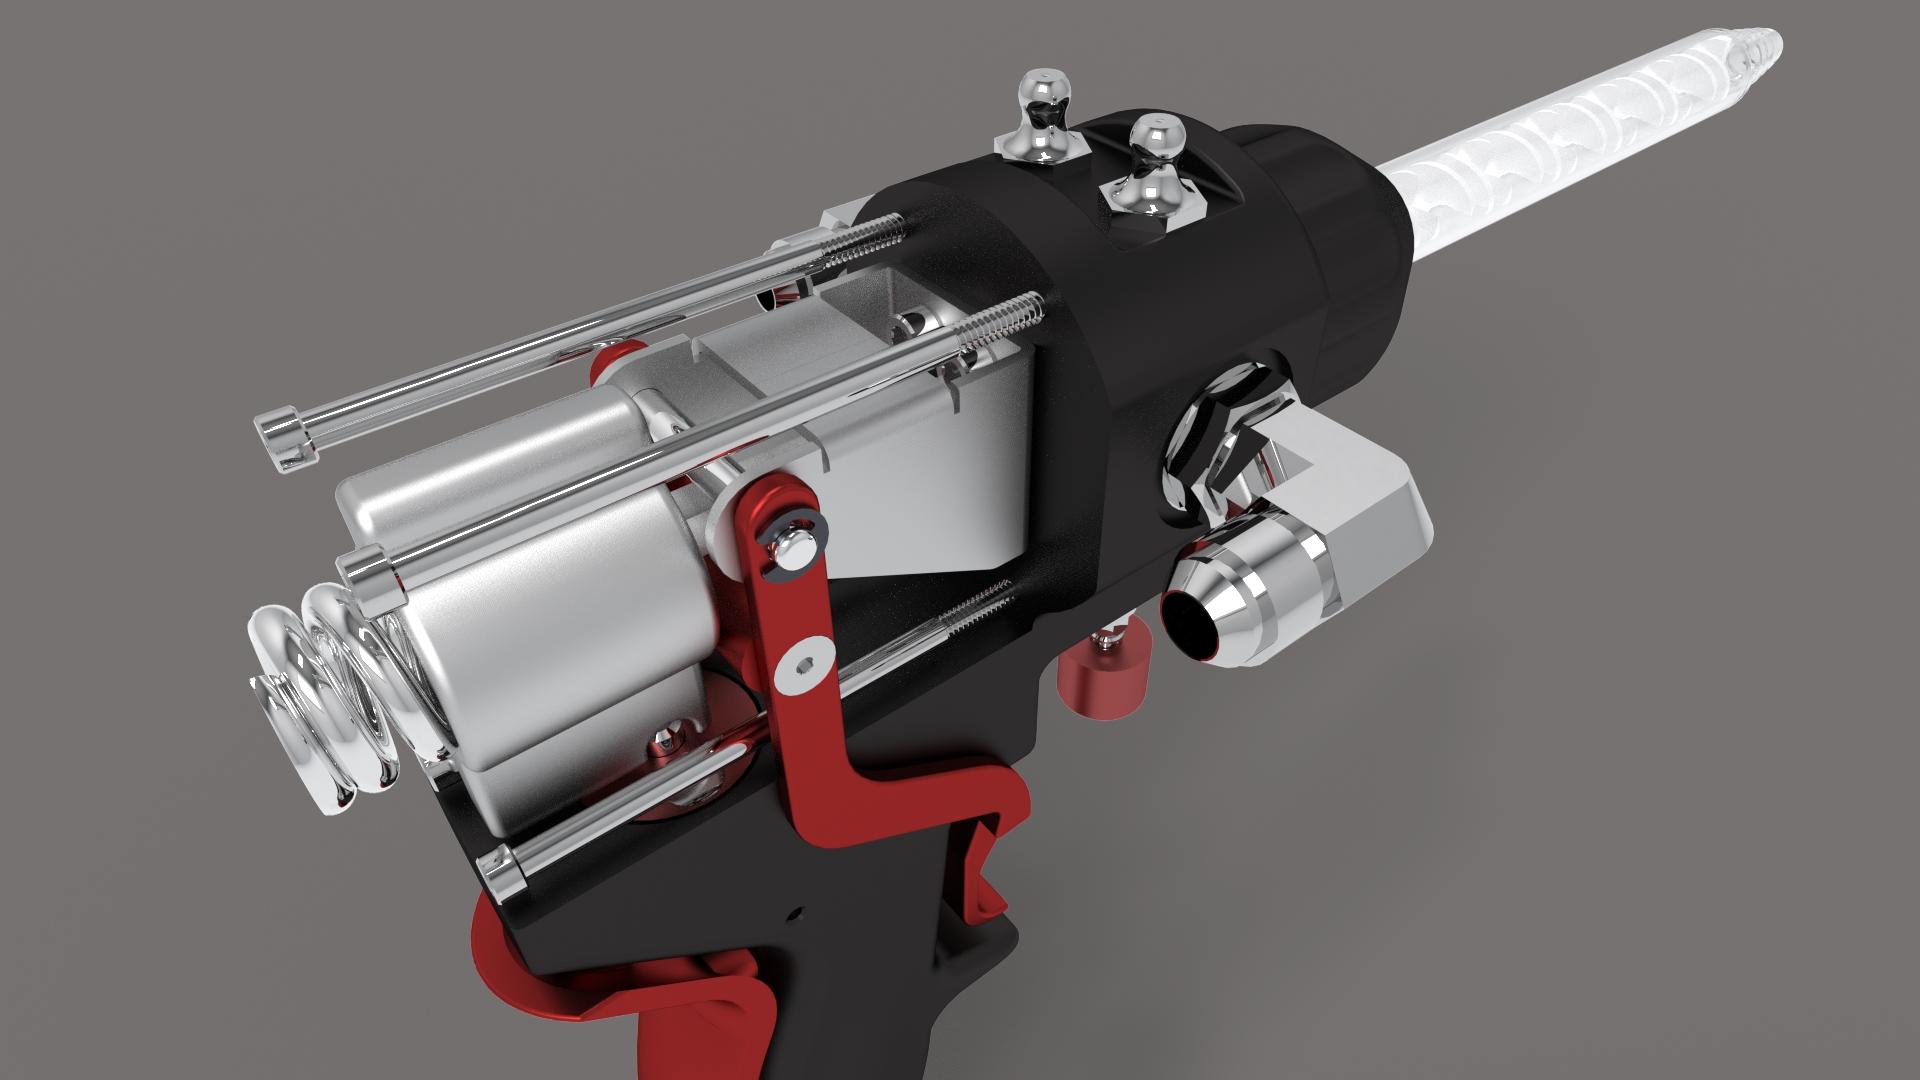 Foam Insulation Spay Gun